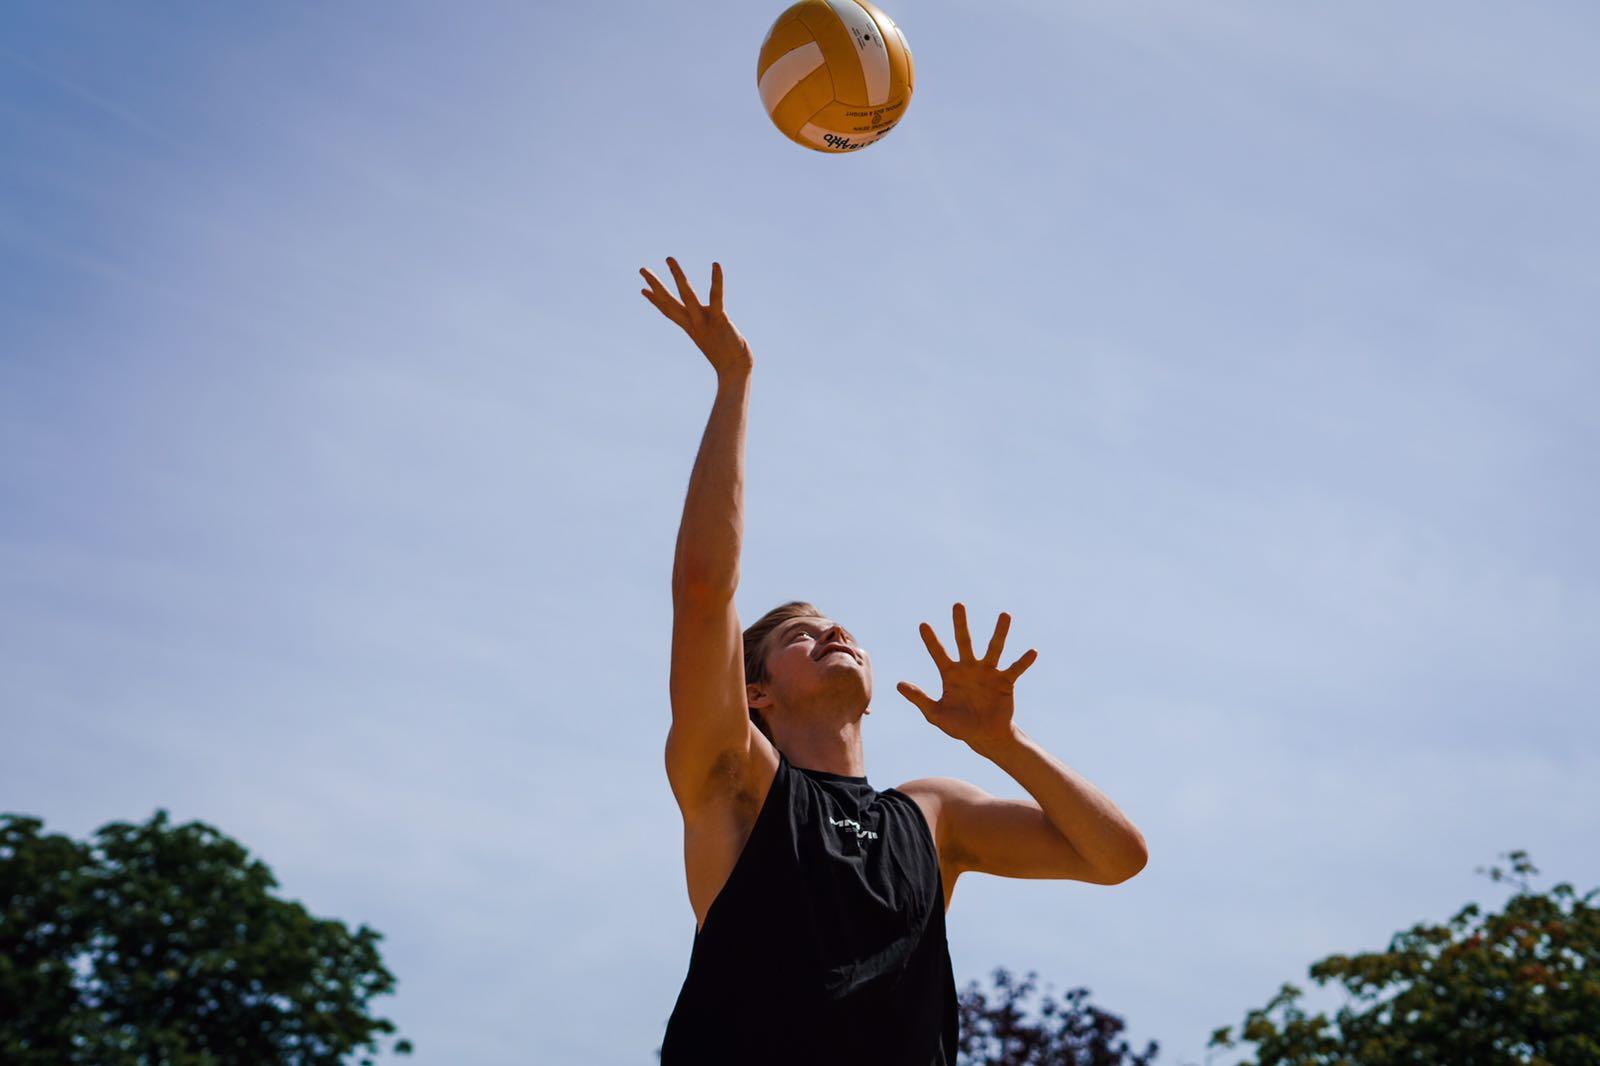 volleyball chiswick hogarth club